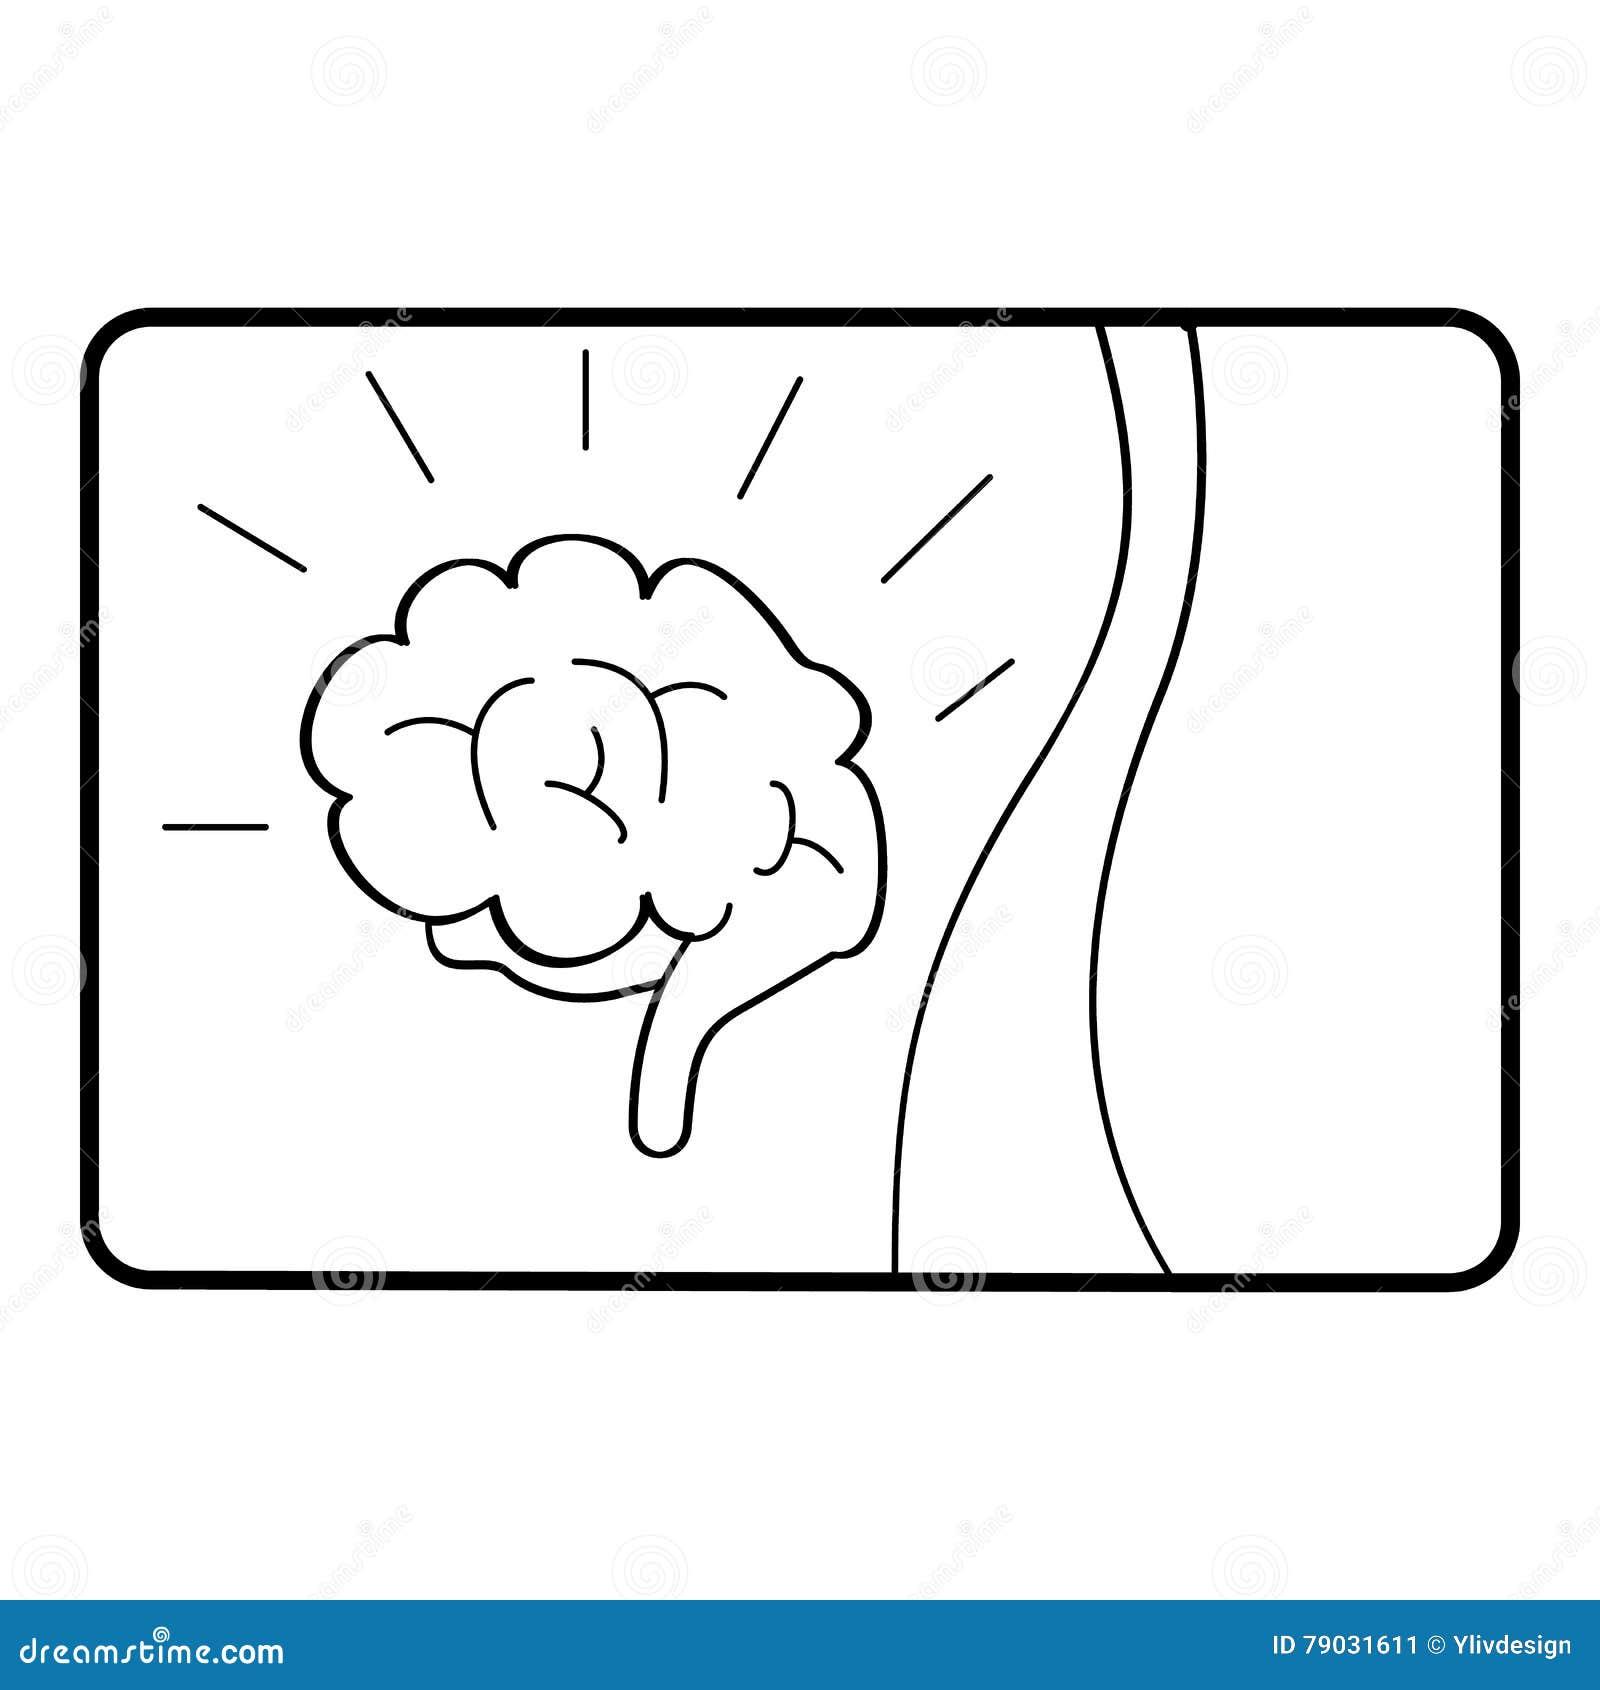 psychosis cartoons  illustrations  u0026 vector stock images